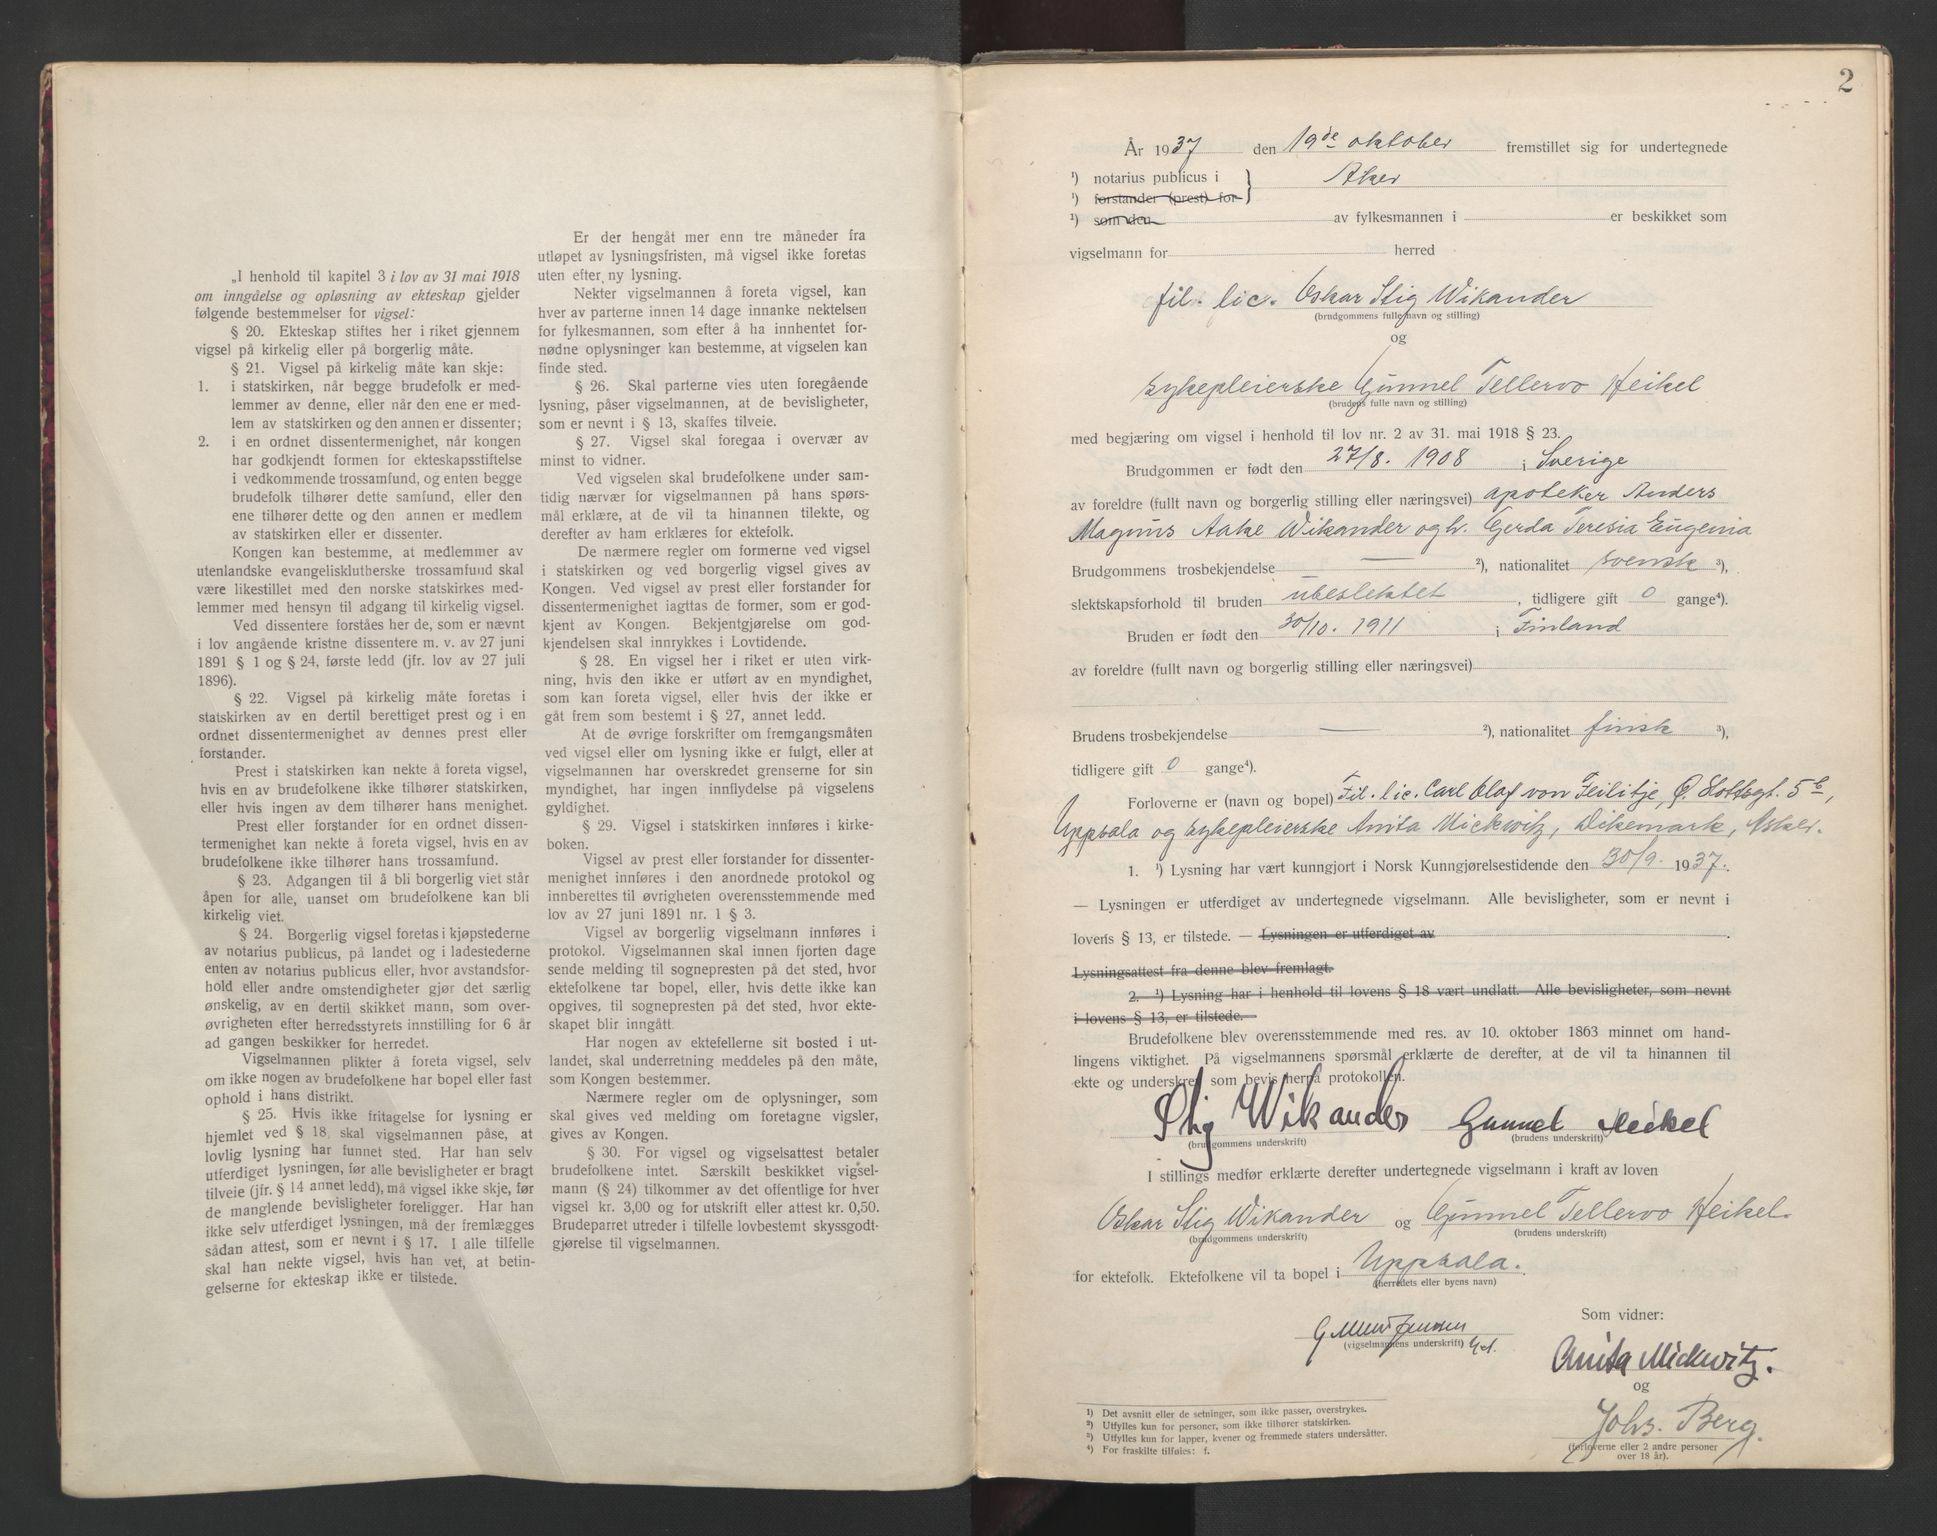 SAO, Aker sorenskriveri, L/Lc/Lcb/L0010: Vigselprotokoll, 1937-1938, s. 2